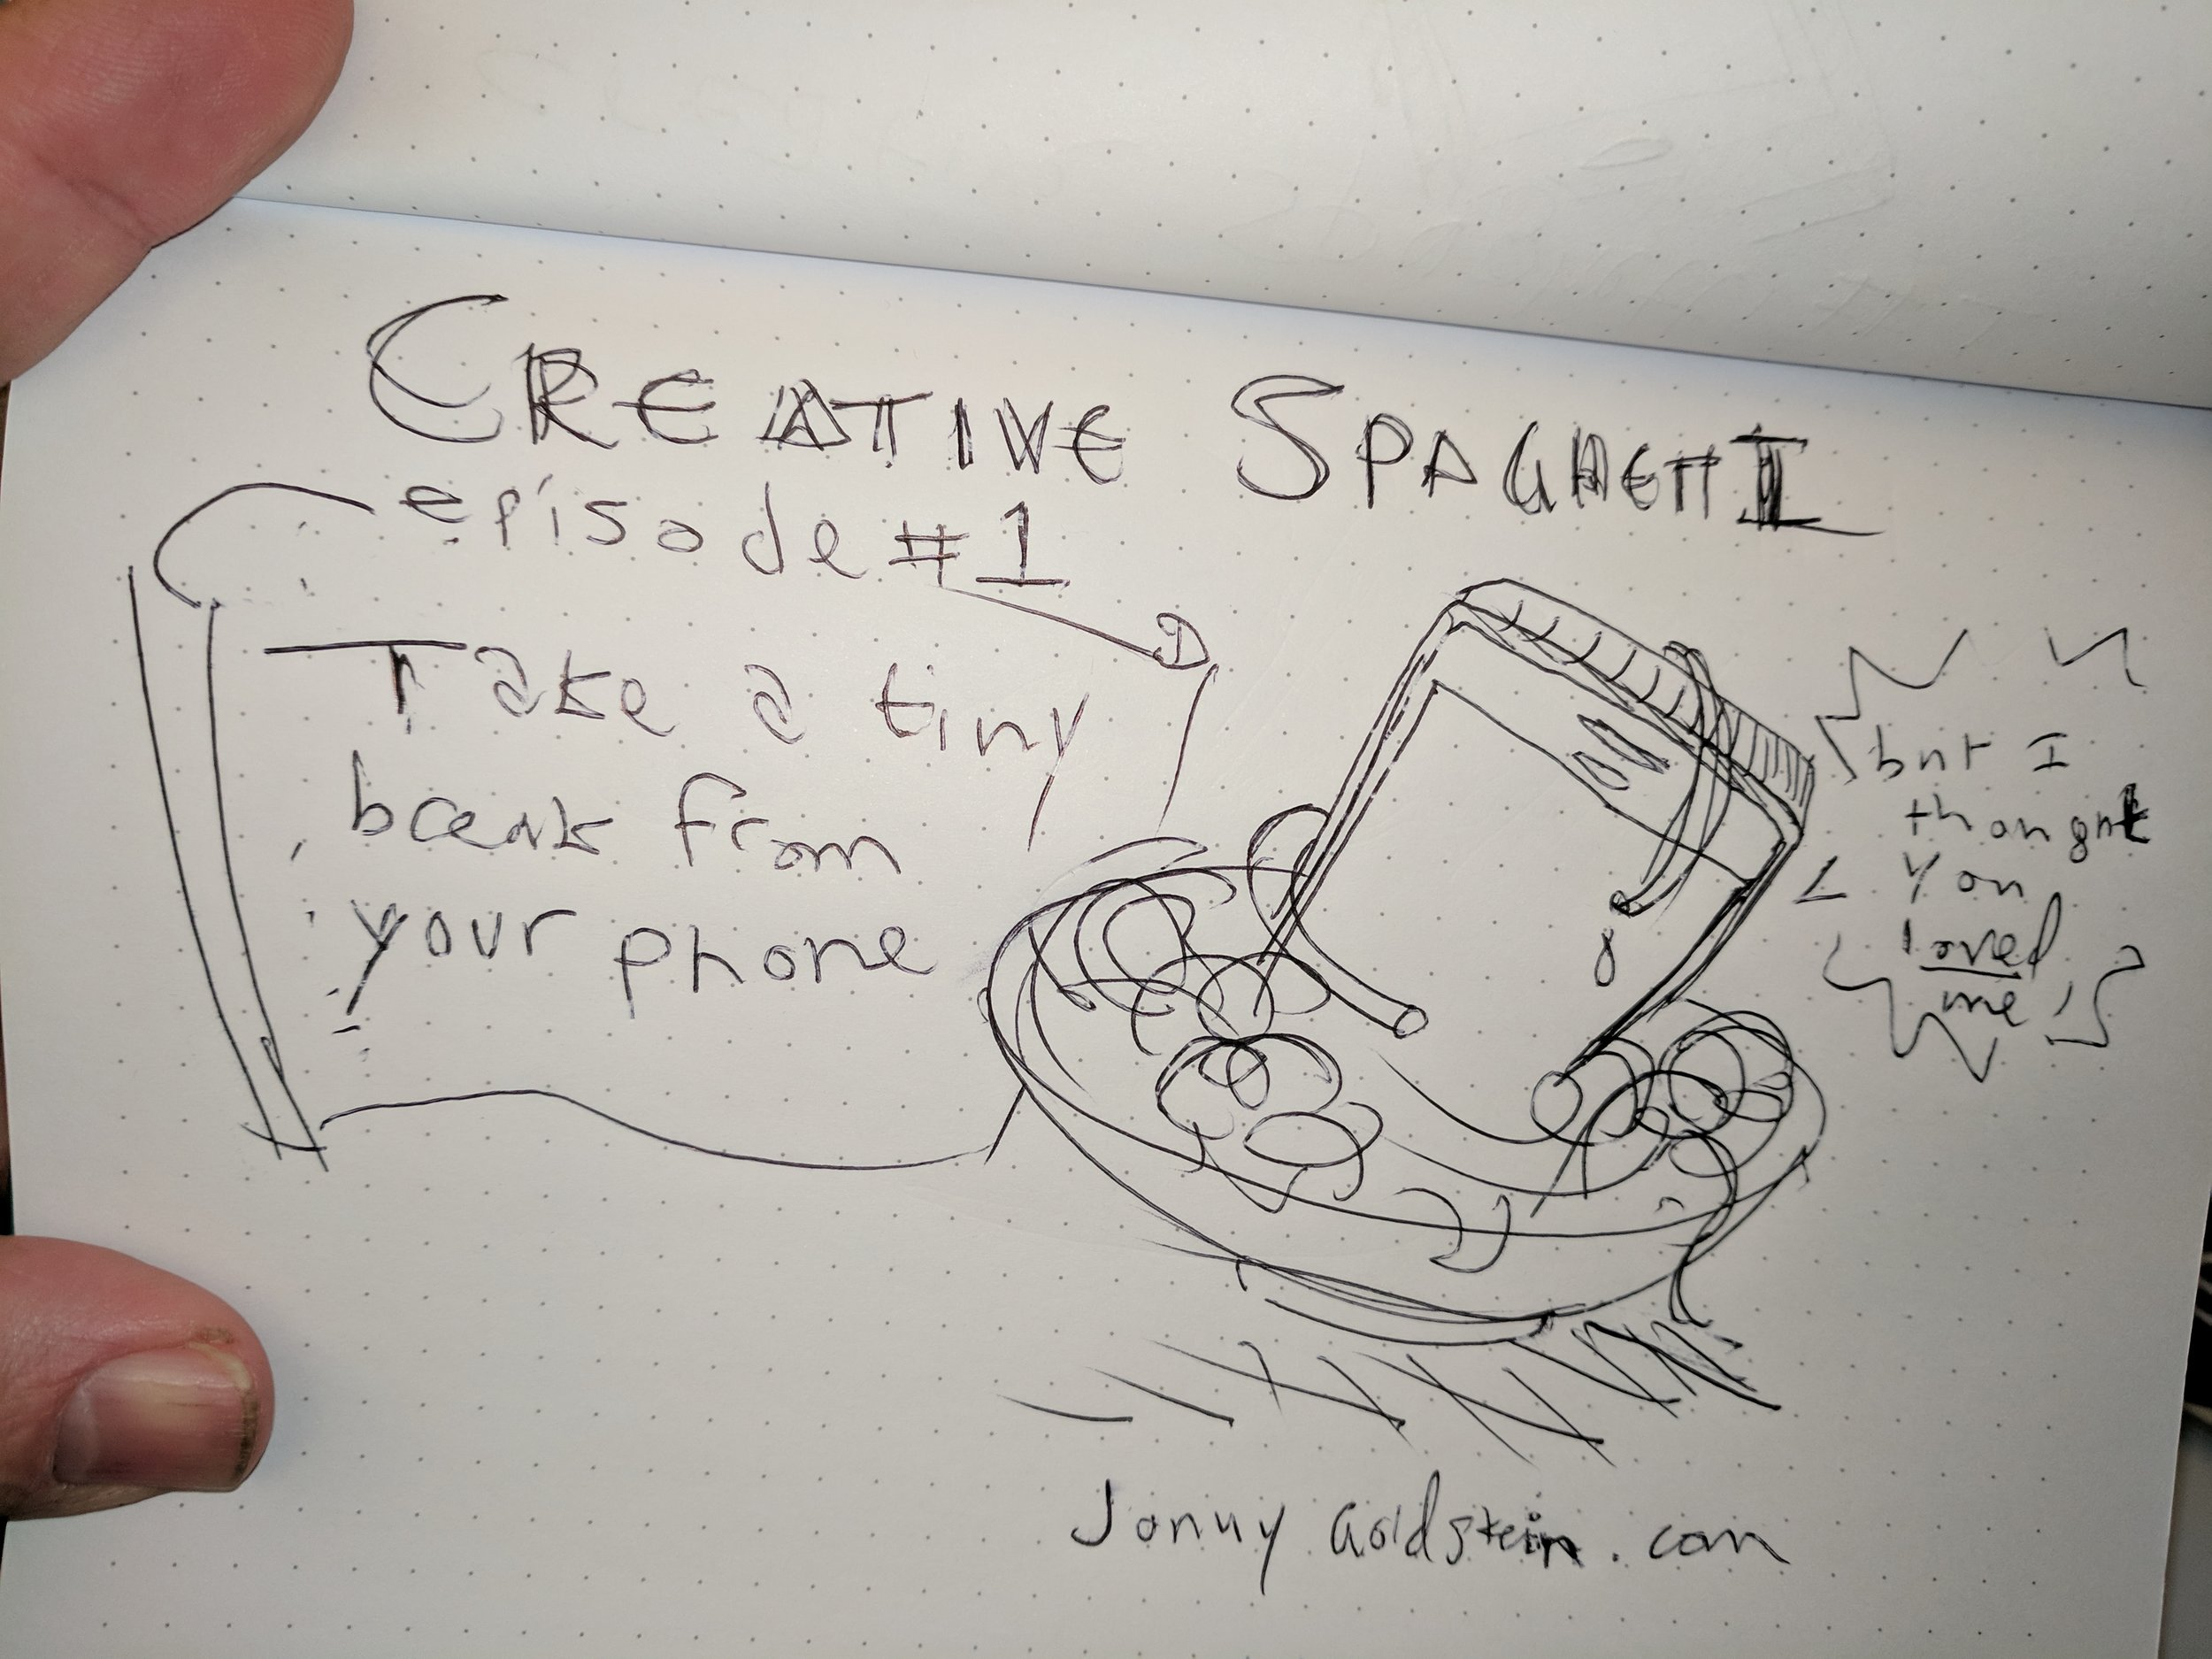 creative-spaghetti-ep1-phone-break.jpg